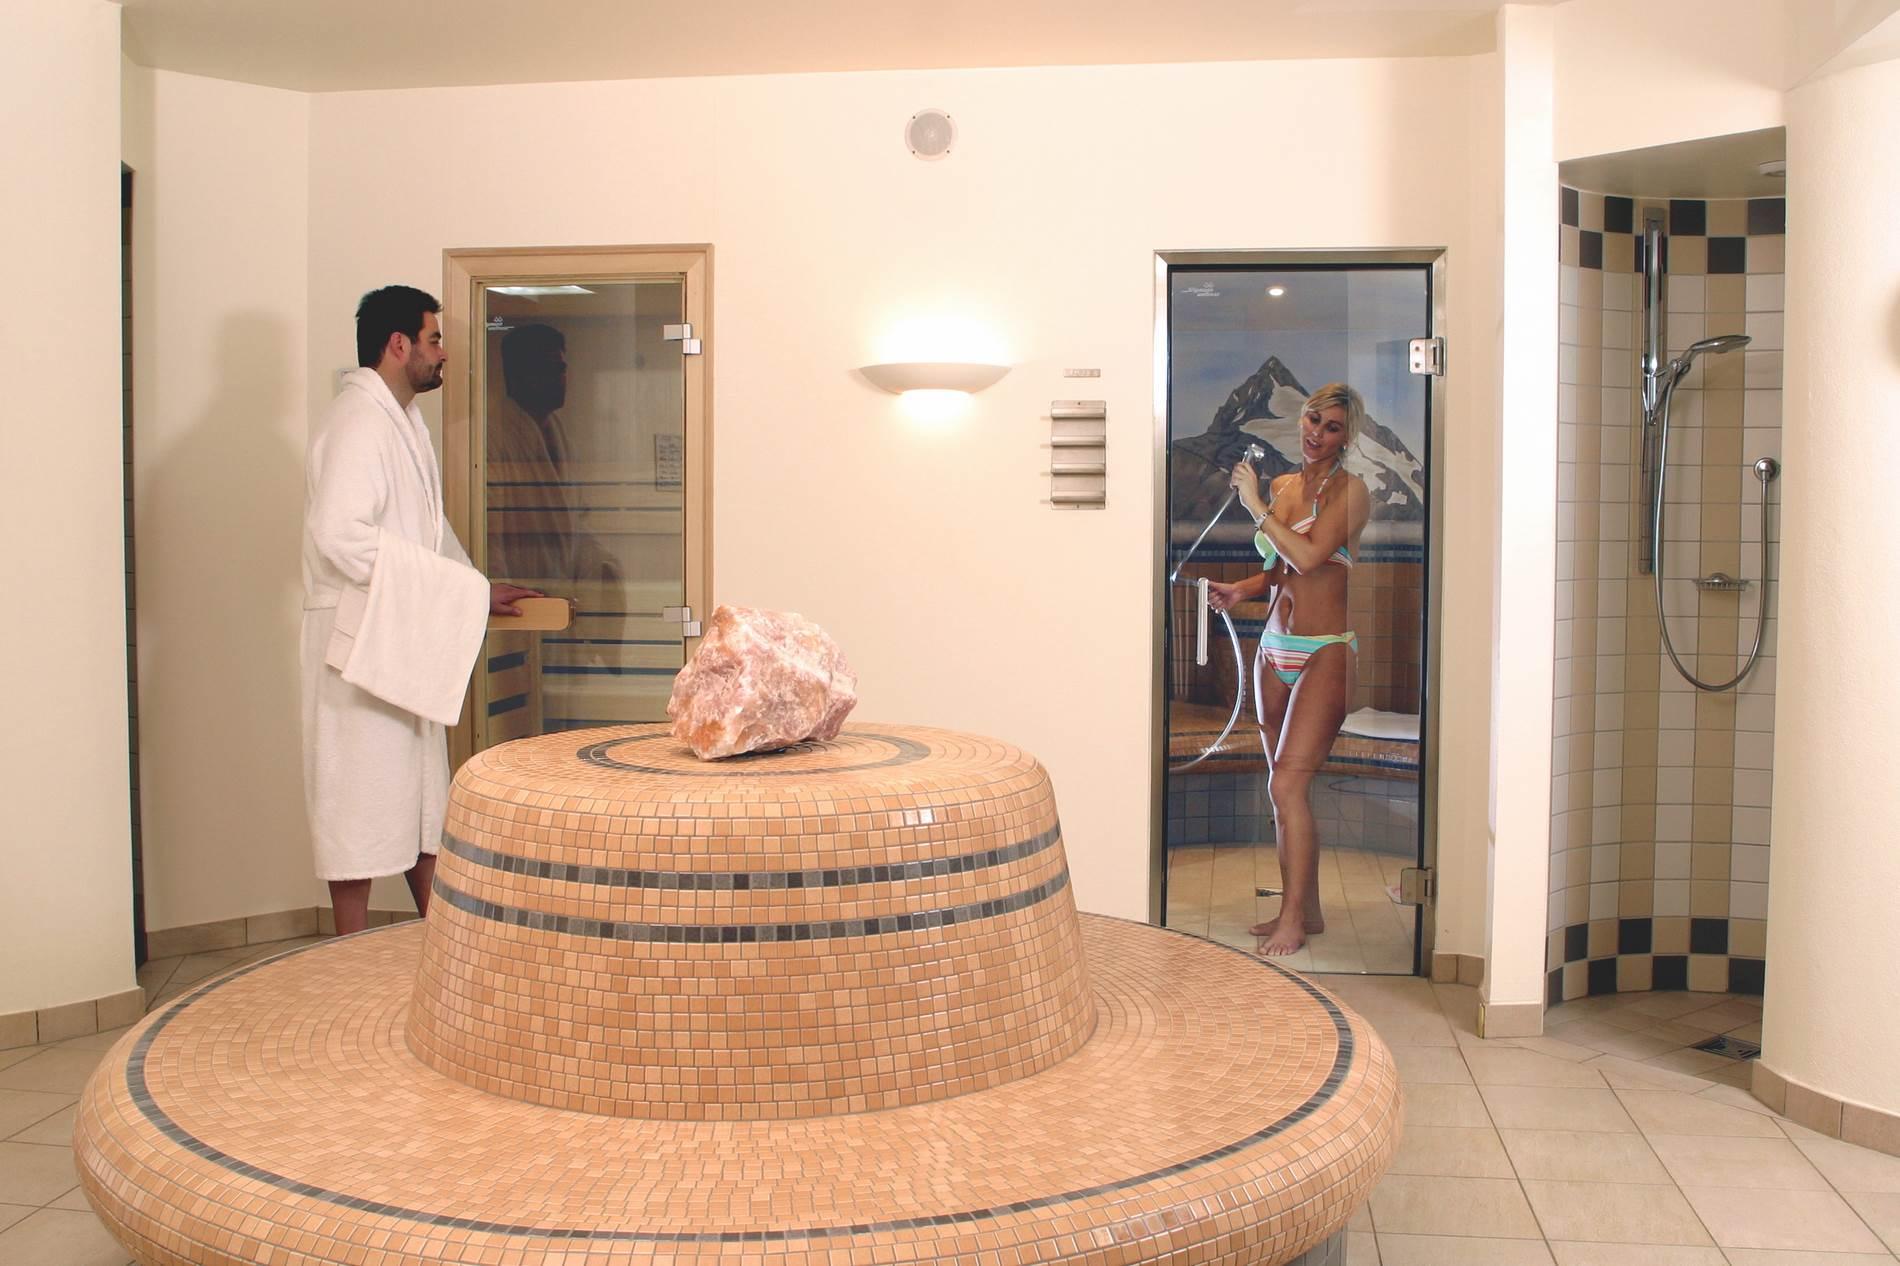 sauna_1900xX